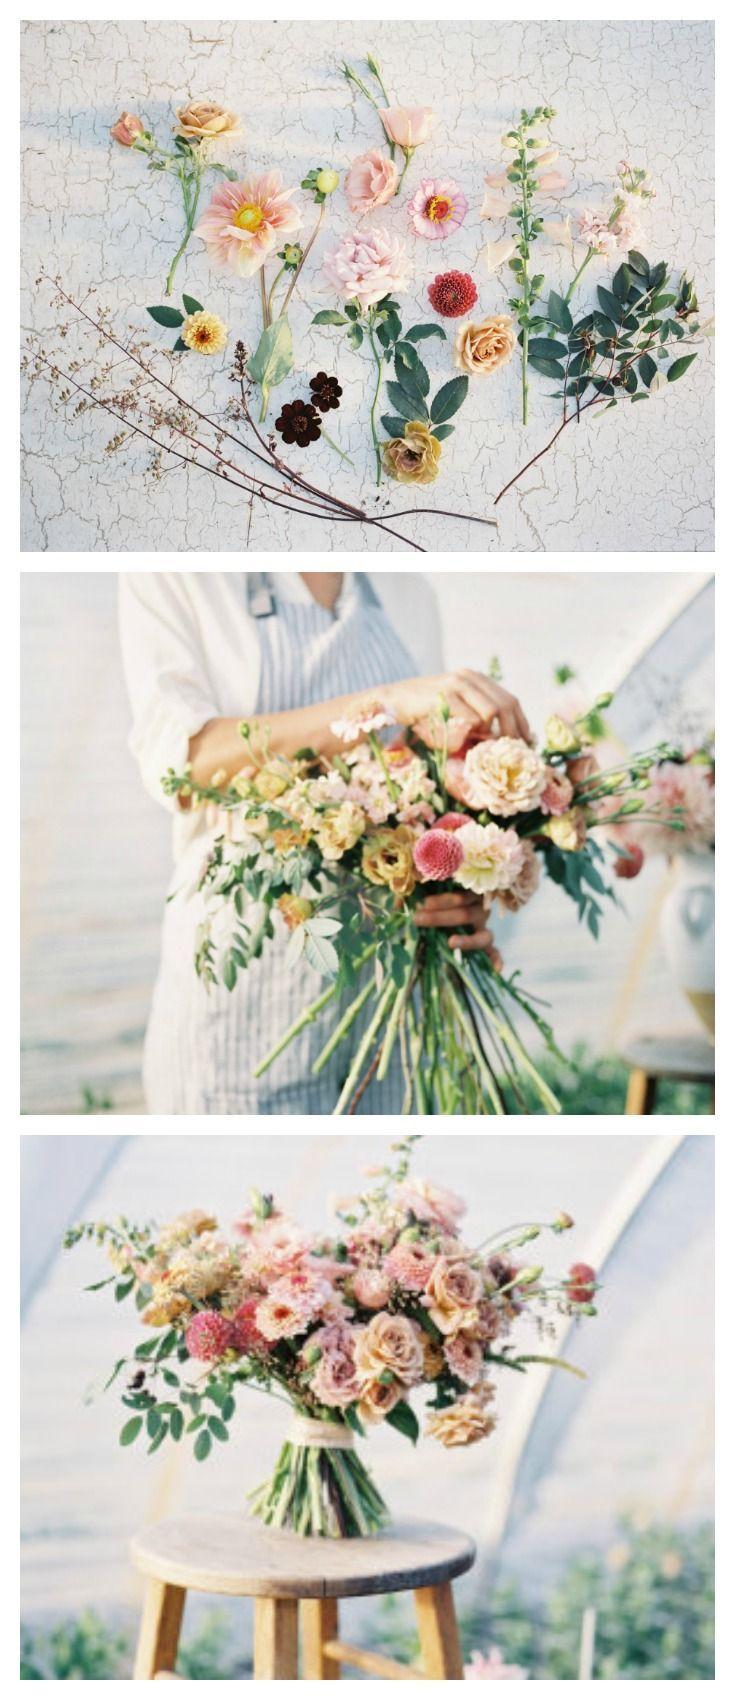 DIY Hand-Tied Garden-Style Bridal Bouquet | Hand tied bouquet ...